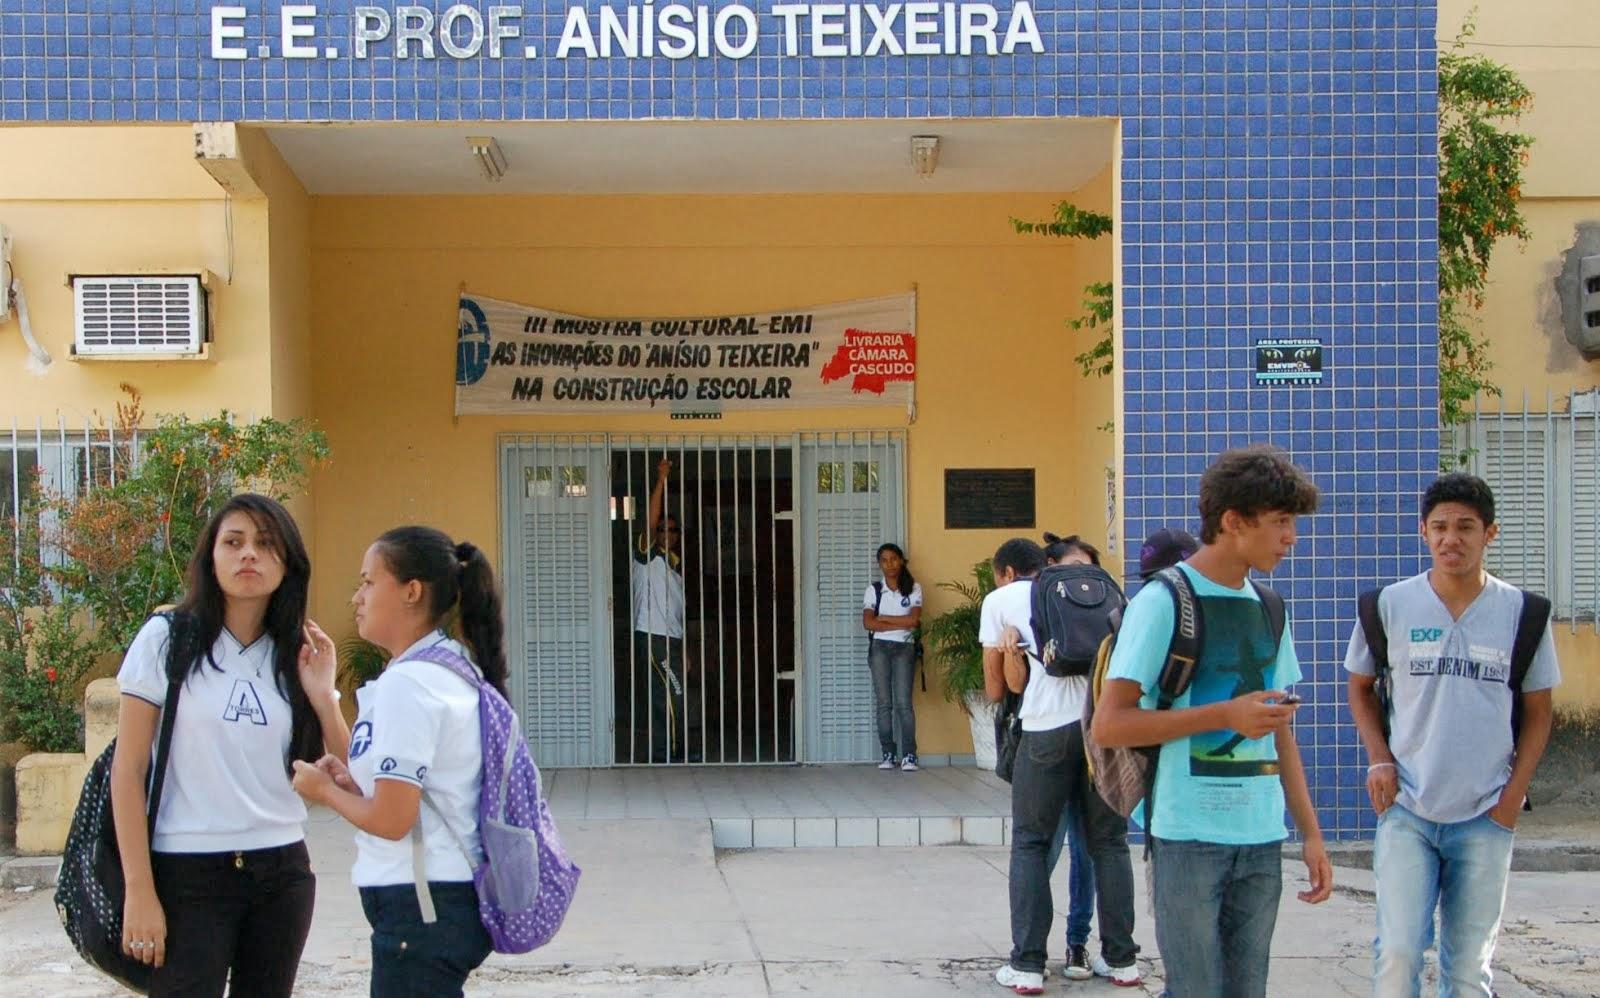 Escola Estadual Professor Anísio Teixeira